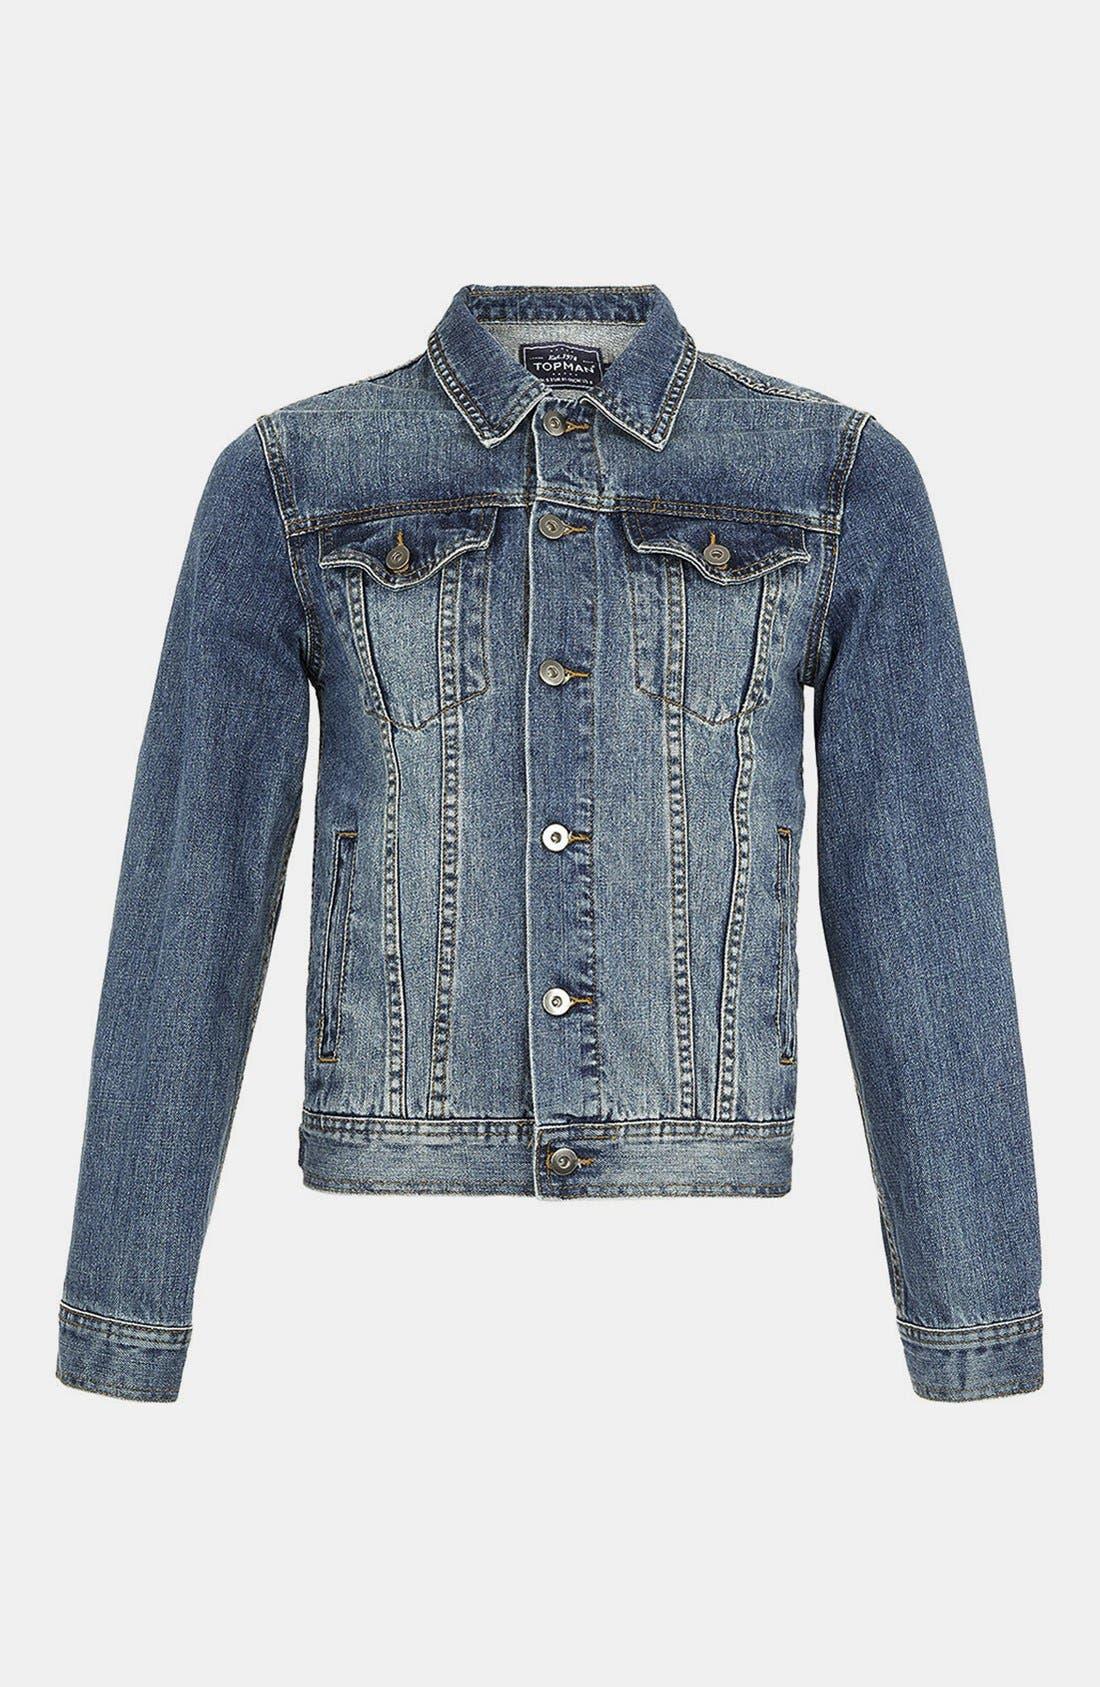 Main Image - Topman Denim Jacket